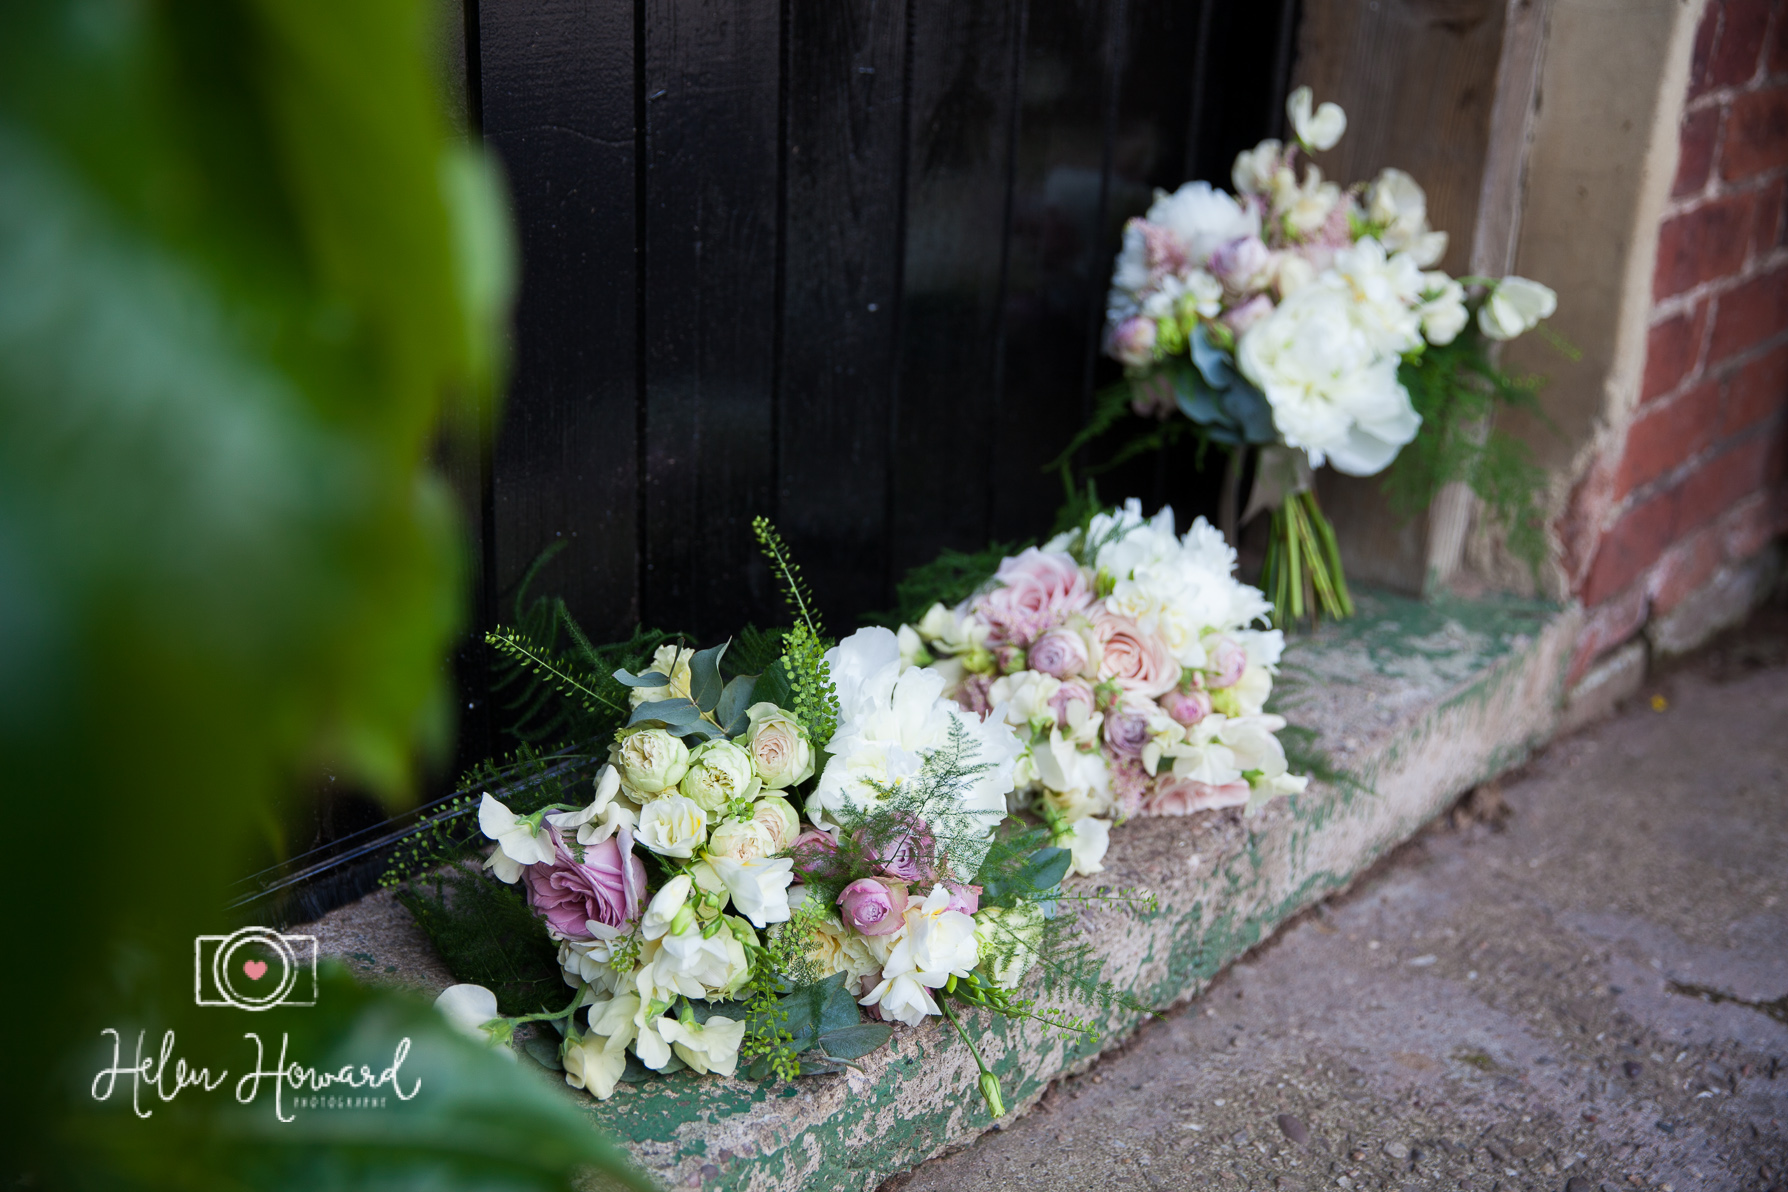 Helen Howard Photography Packington Moor Wedding-91.jpg